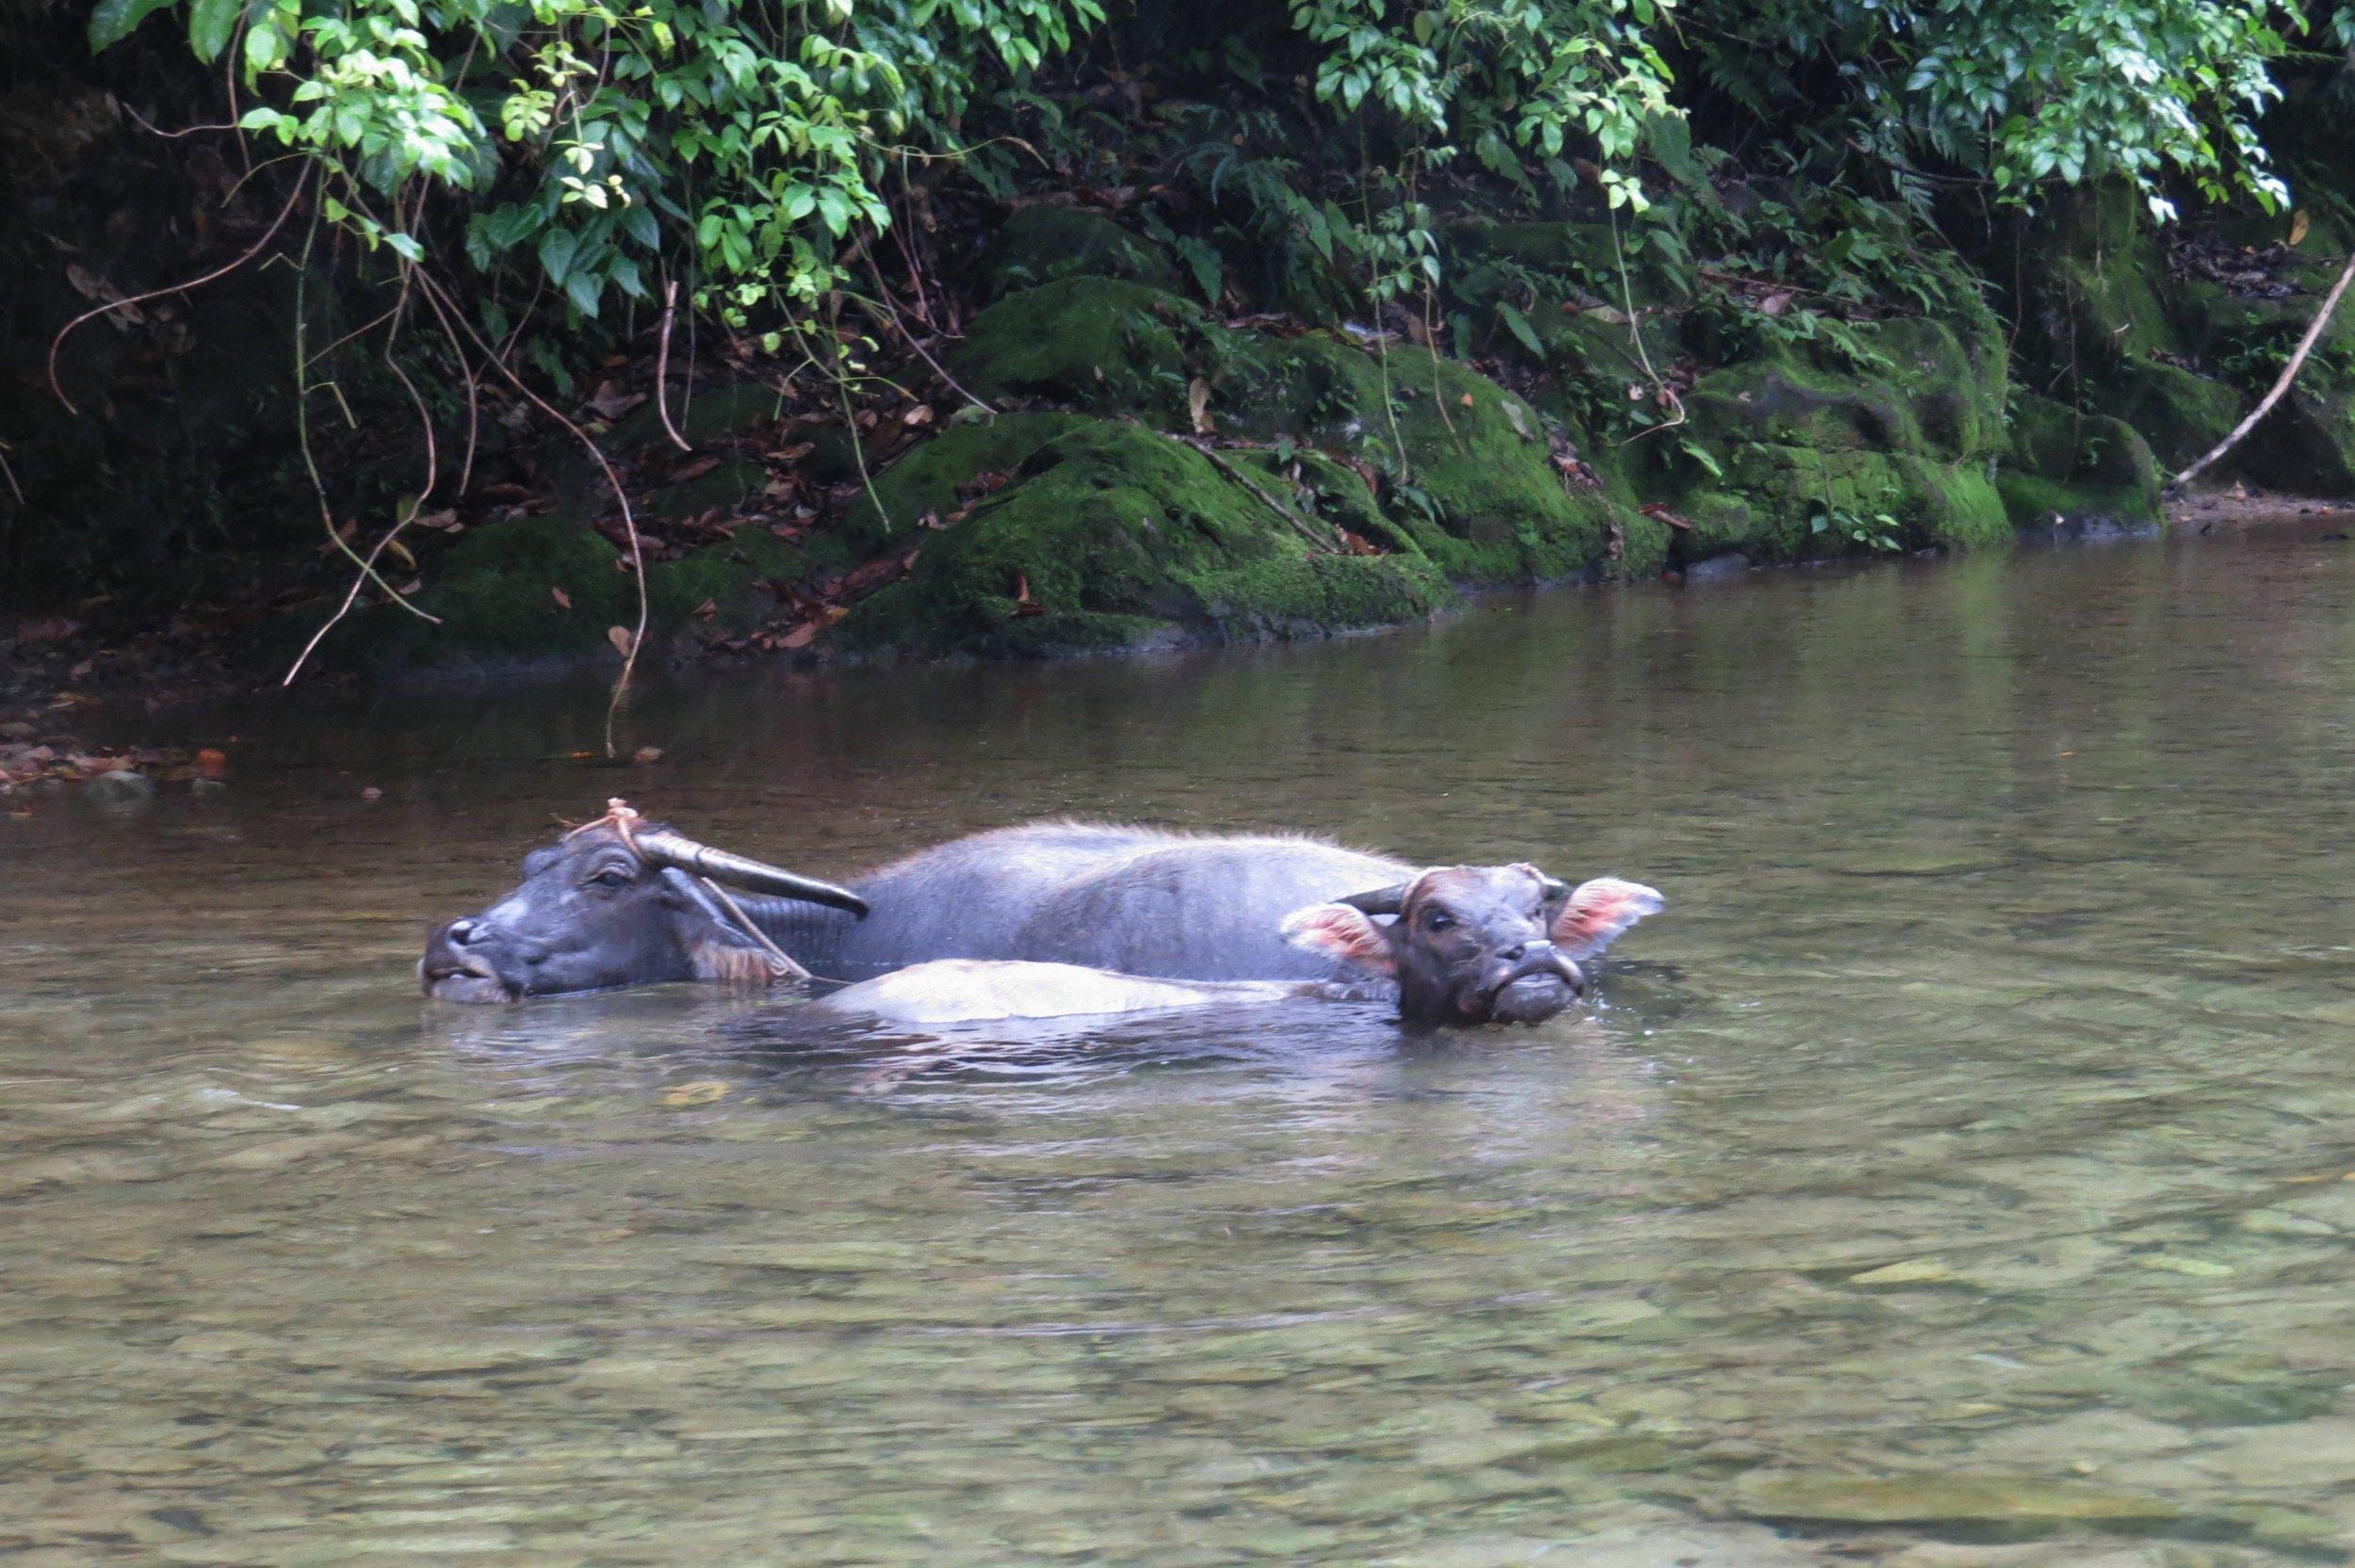 Carabao in water